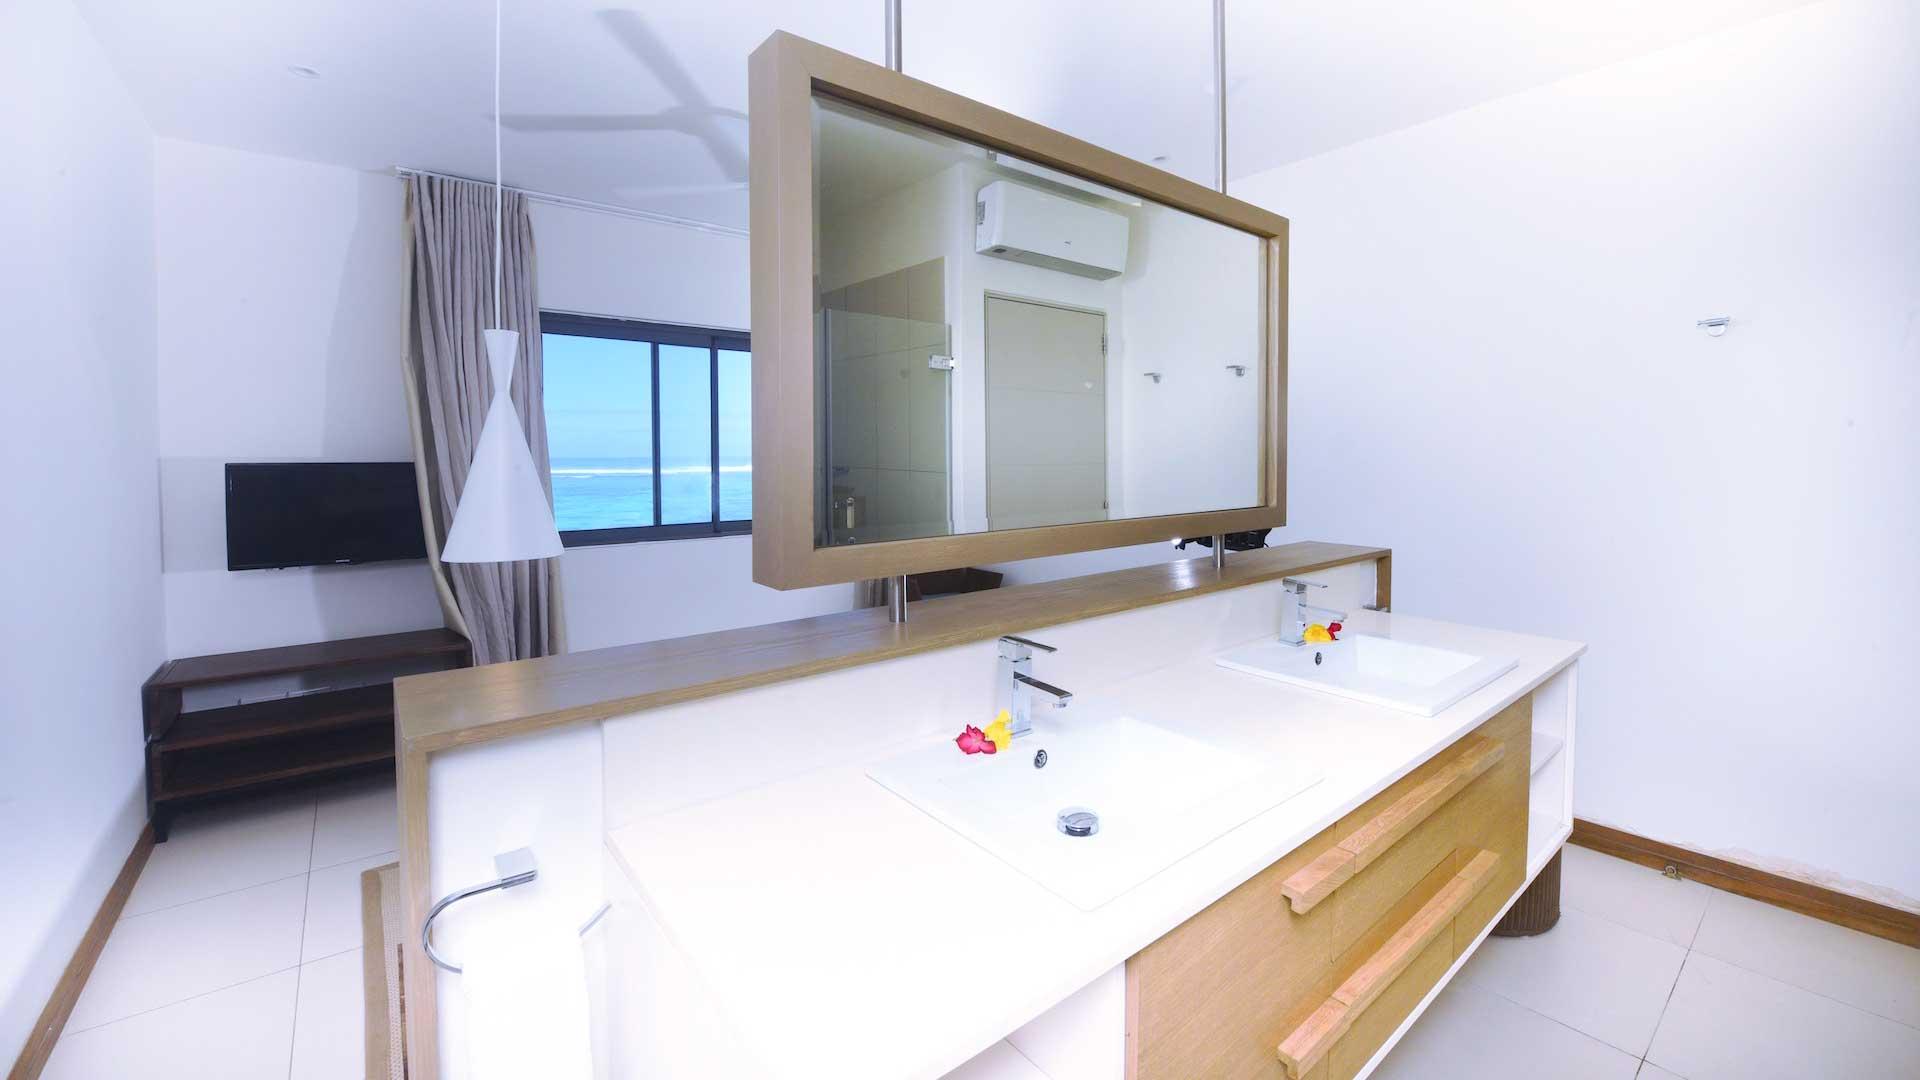 Photos of villa Blue Beach House in Mauritius South East